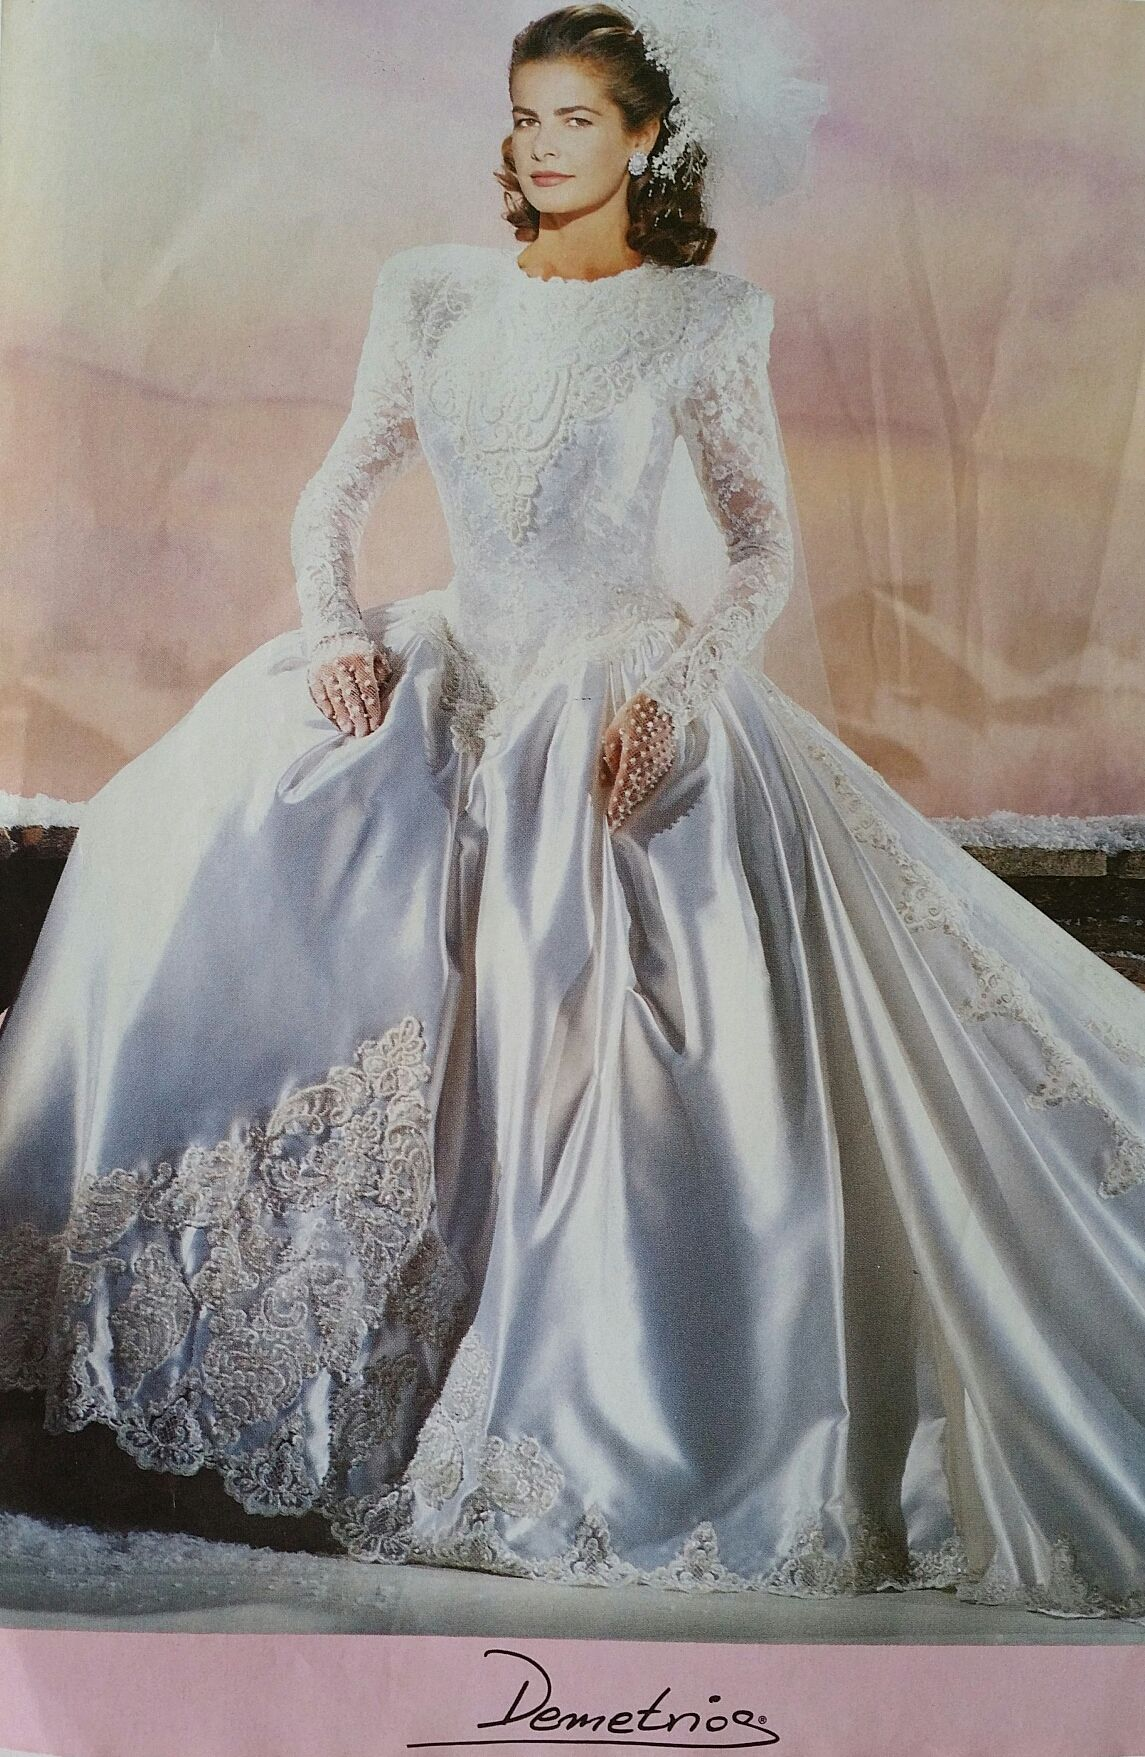 Demetrios 1992/1993 | Demetrios 90\'s collections | Pinterest ...